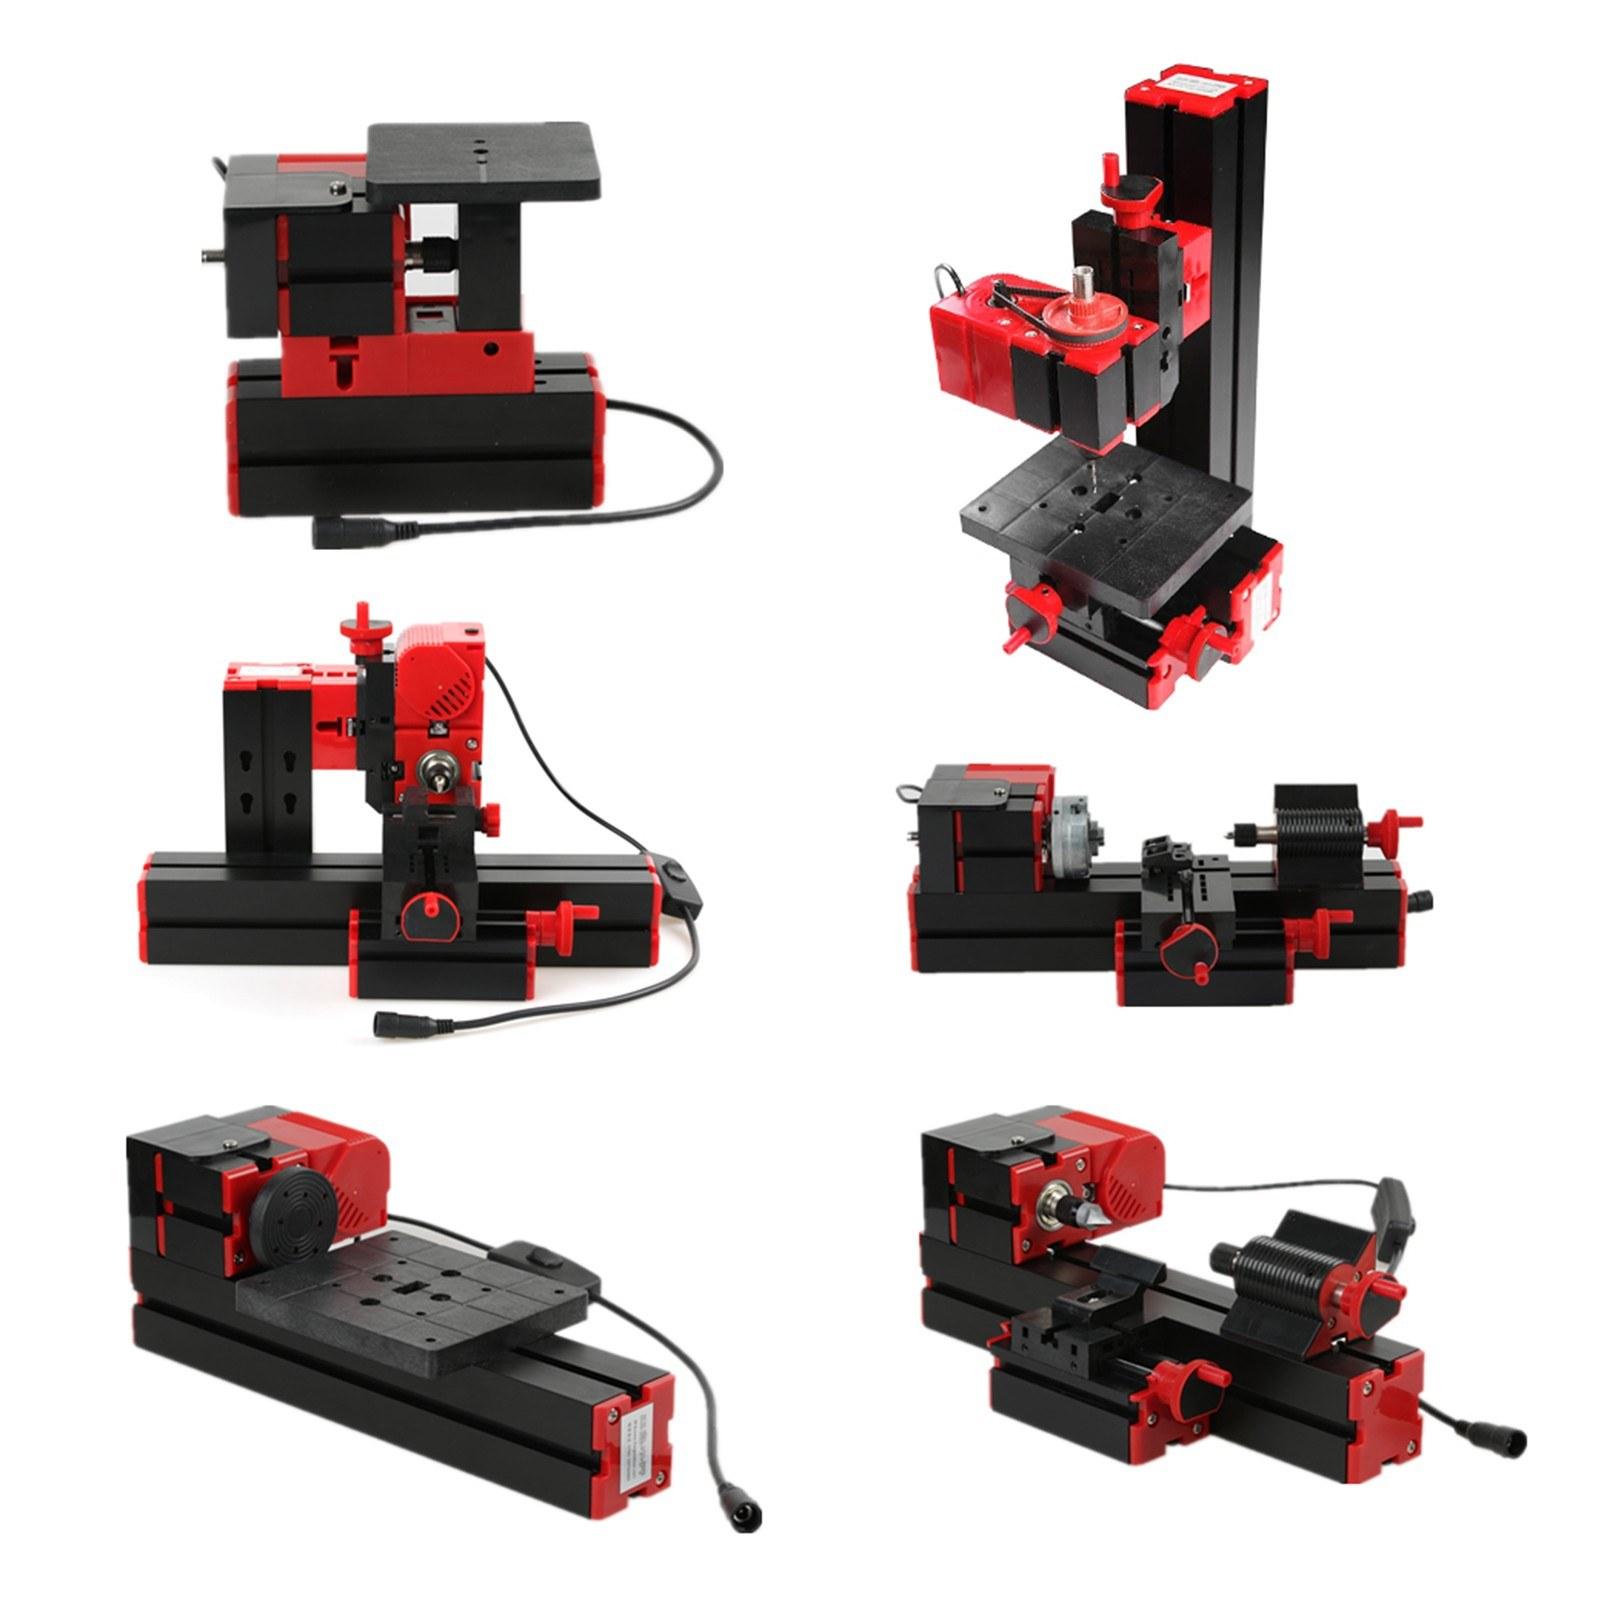 Tomtop - [EU Warehouse] 38% OFF Mini DIY 6 in 1 Multi-functional Motorized Transformer, $102.99 (Inclusive of VAT)